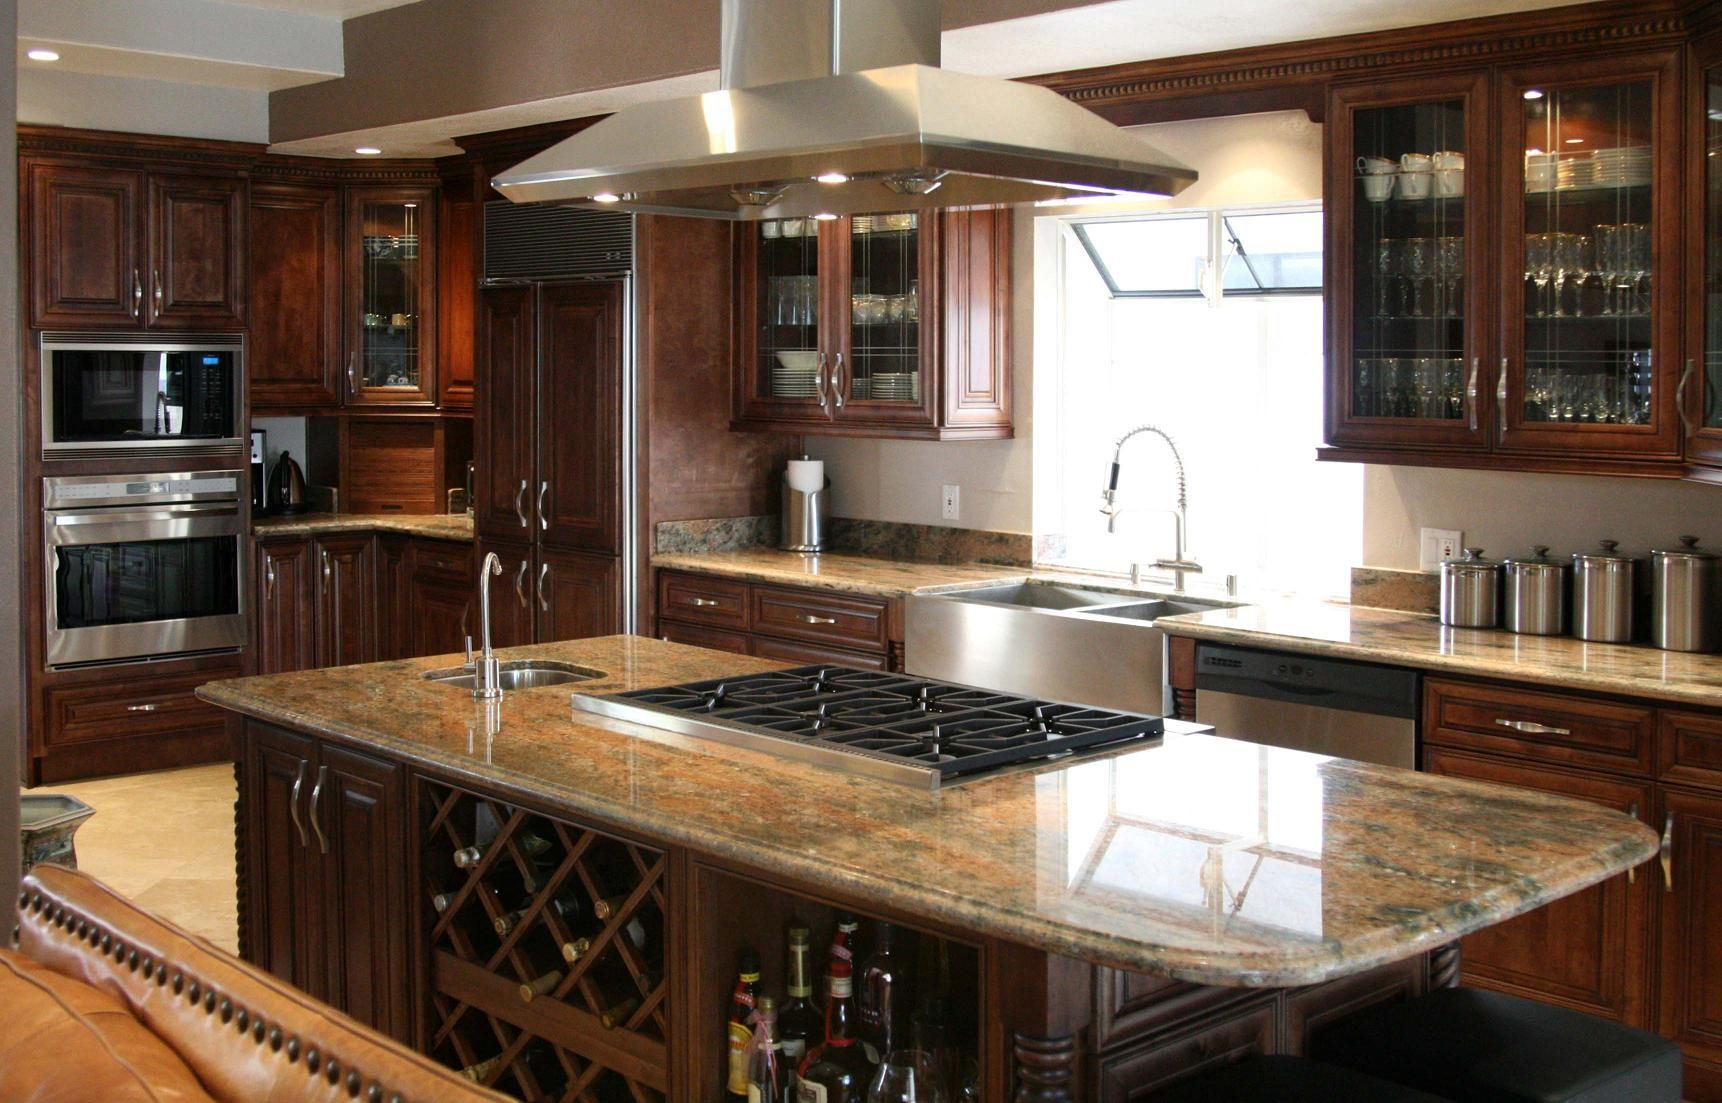 52 dark kitchens with dark wood and black kitchen cabinets. small